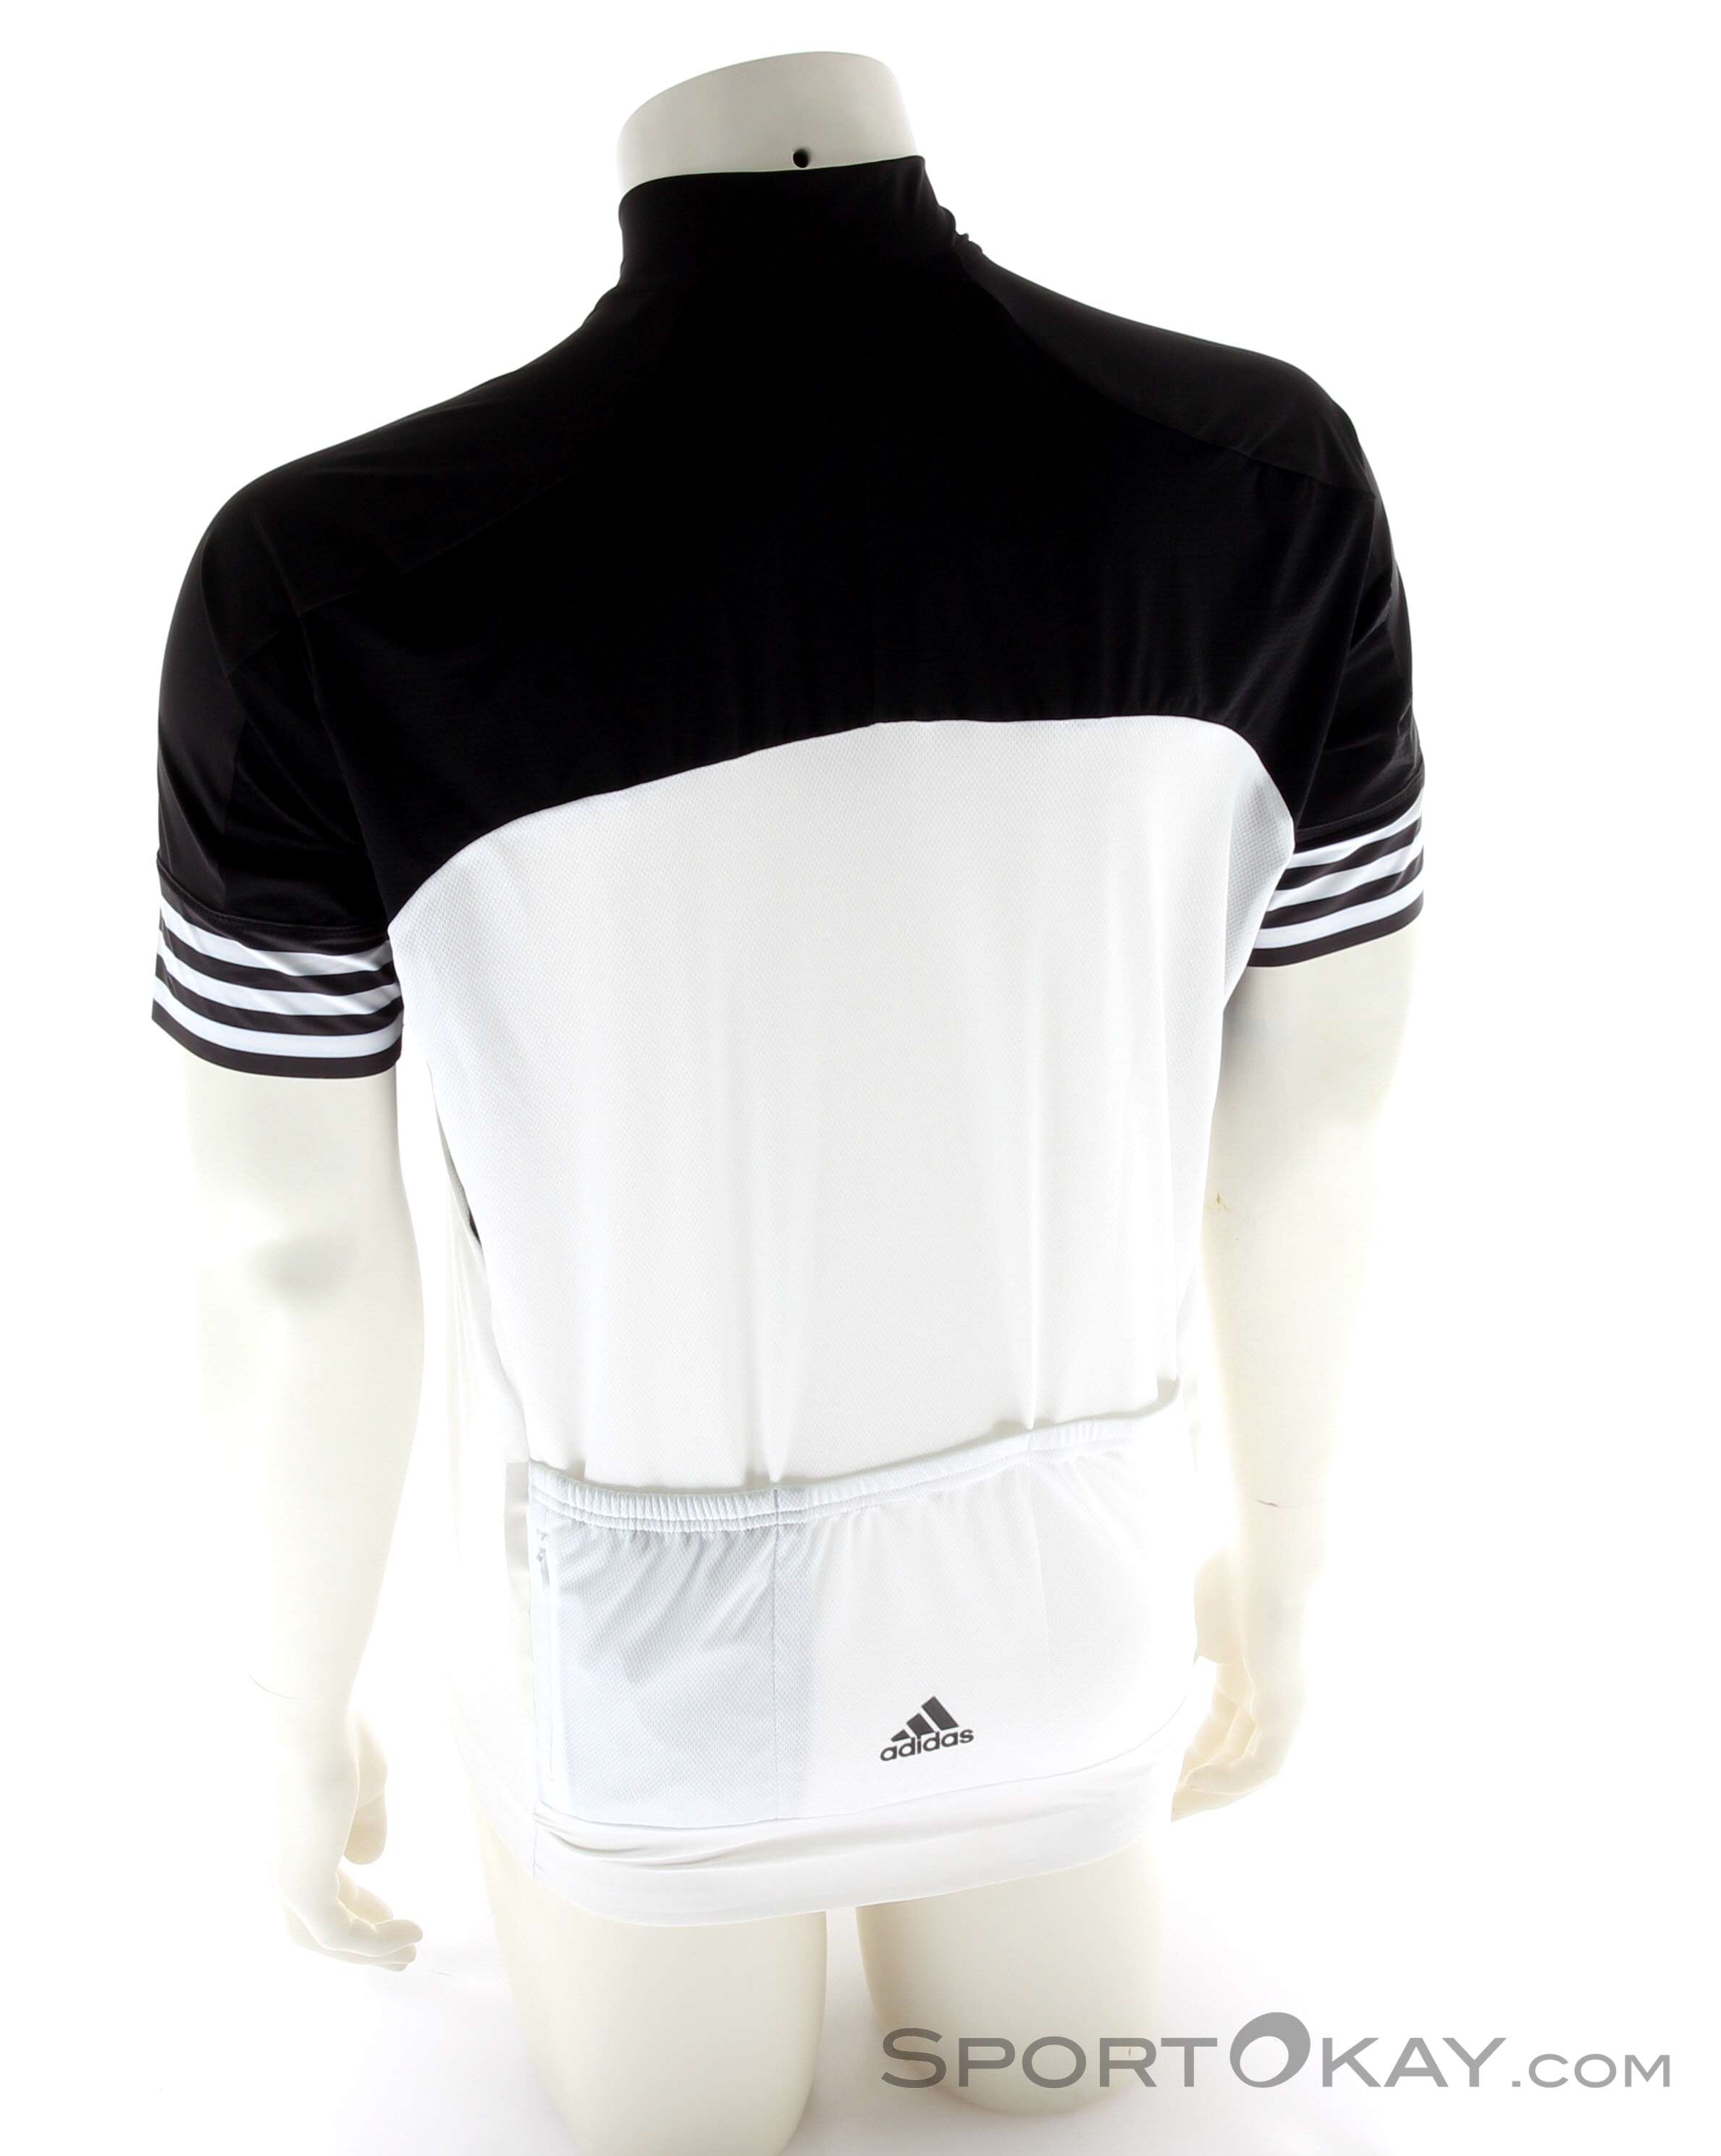 adidas Adistar SS Jersey Mens Biking Shirt - Shirts   T-Shirts ... b6c2aa112